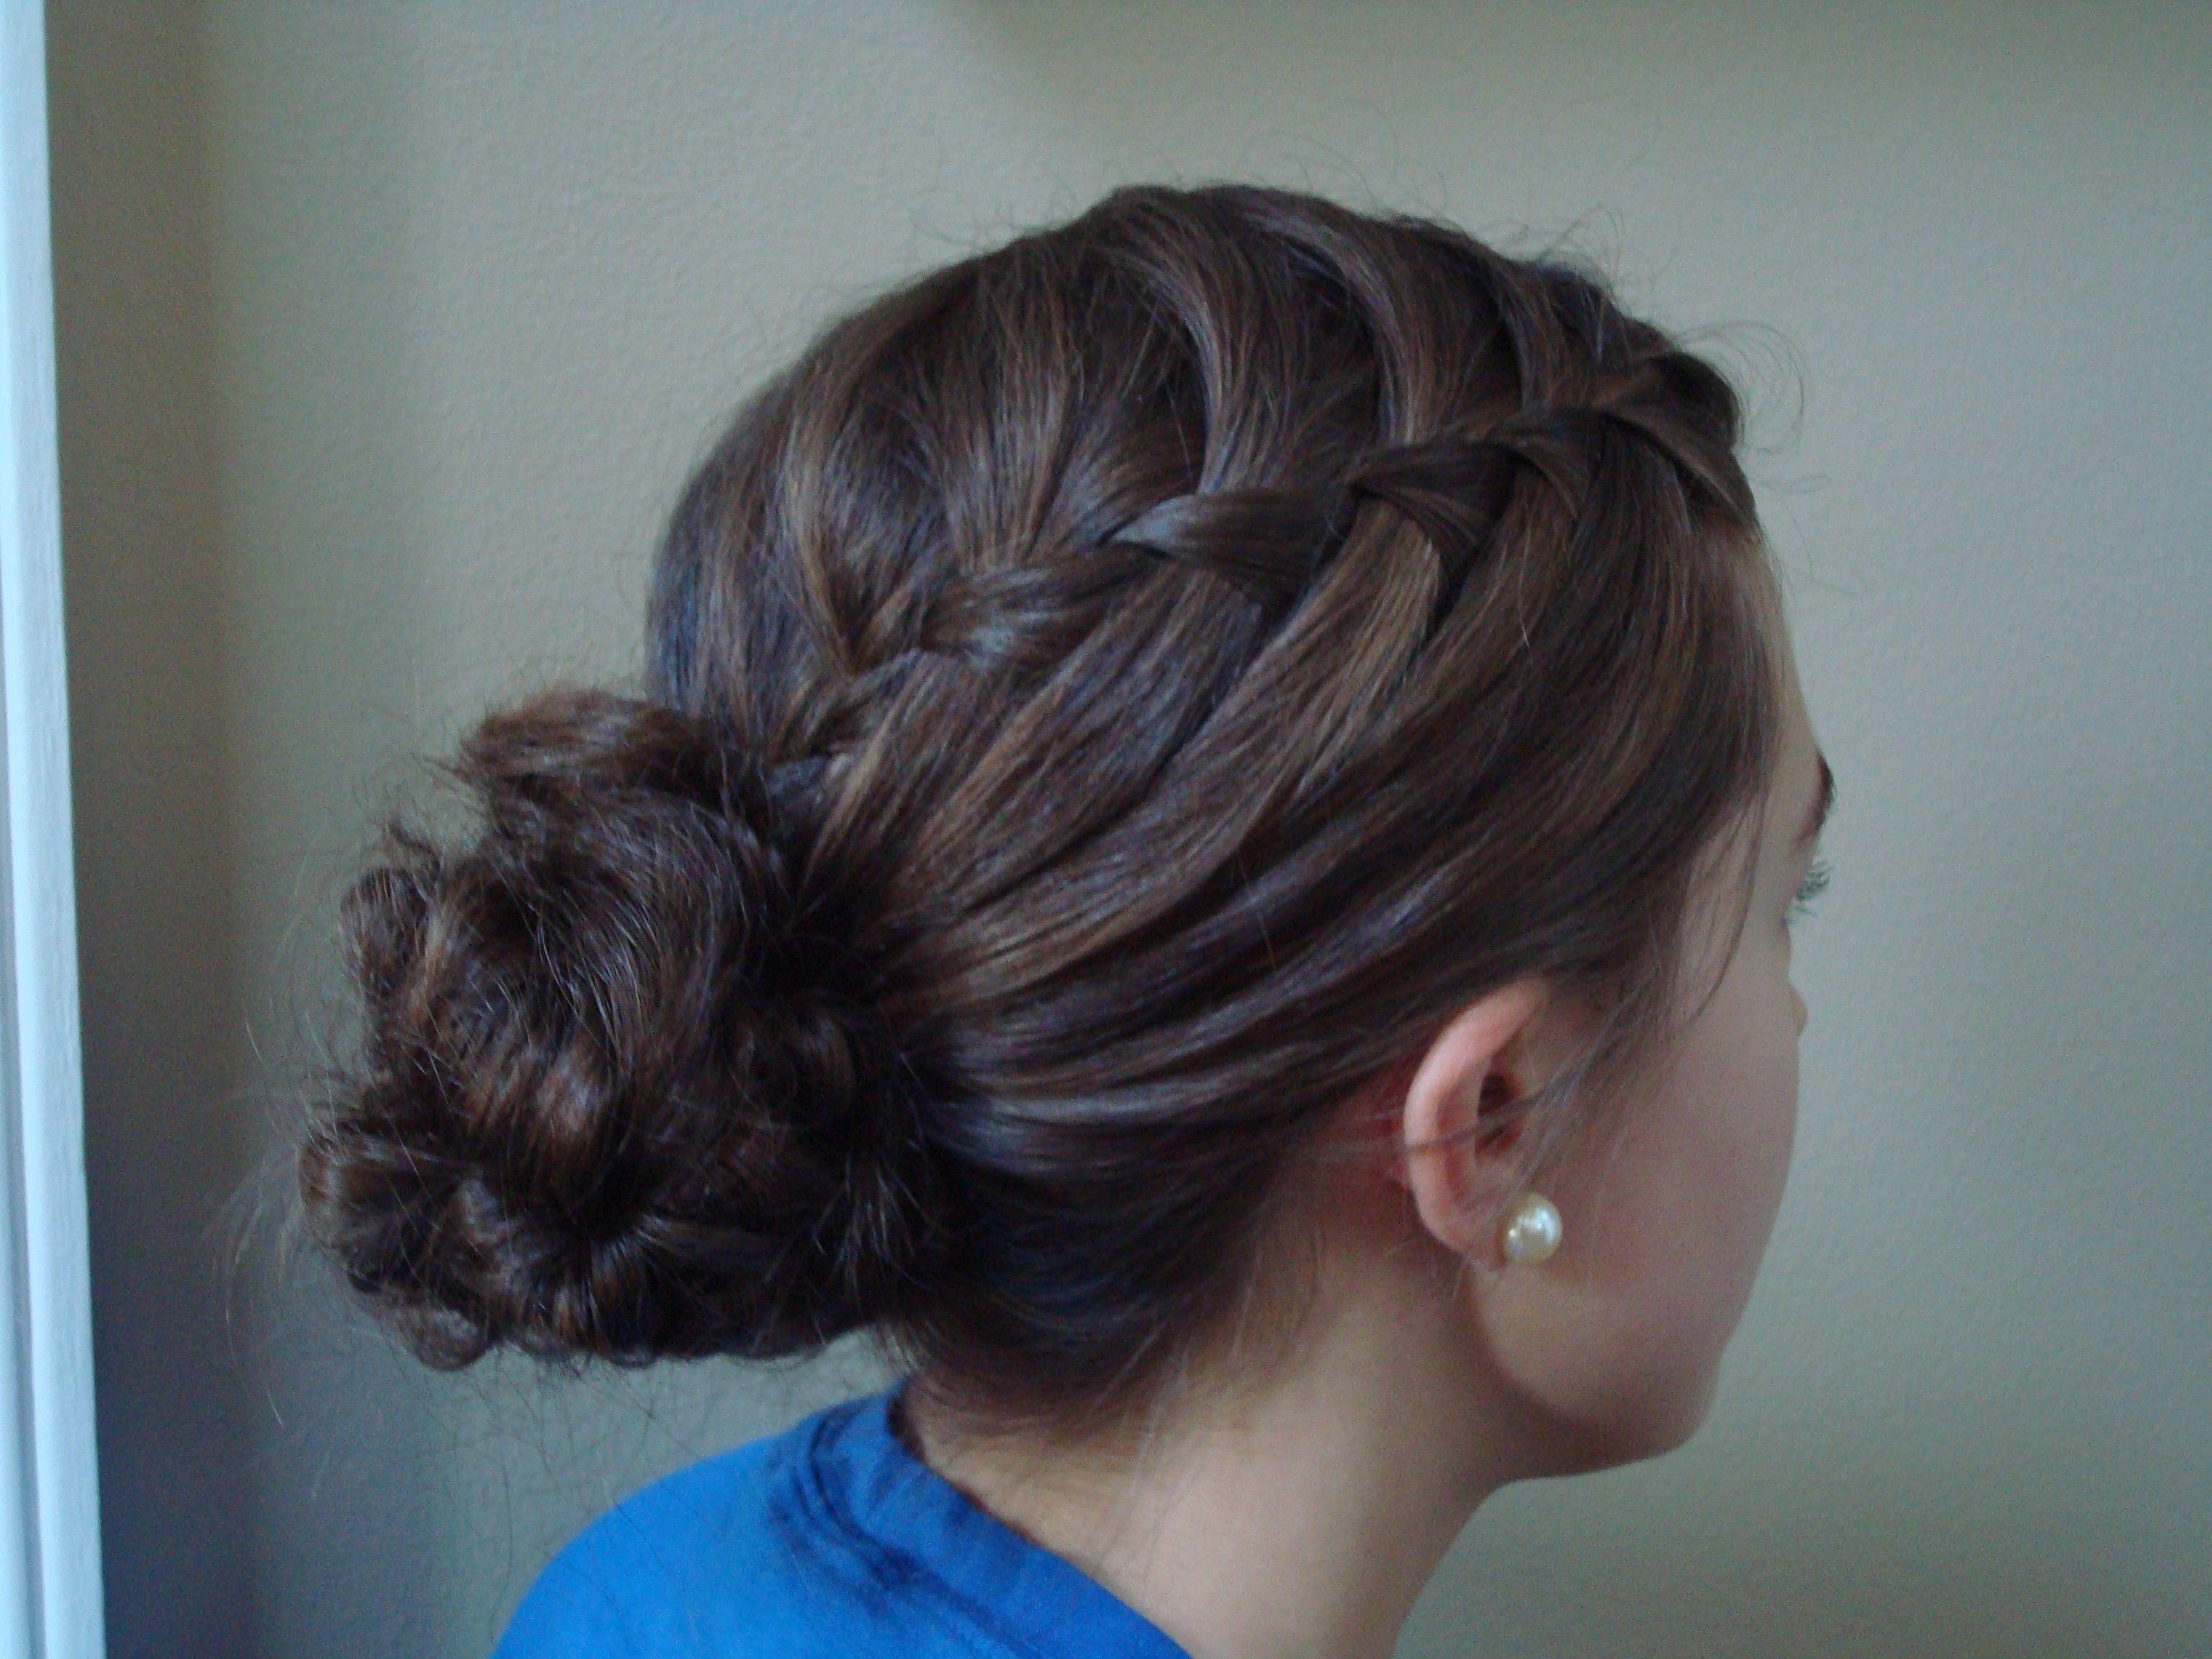 How To Do A Waterfall Braid Bun | waterfall braids and ...